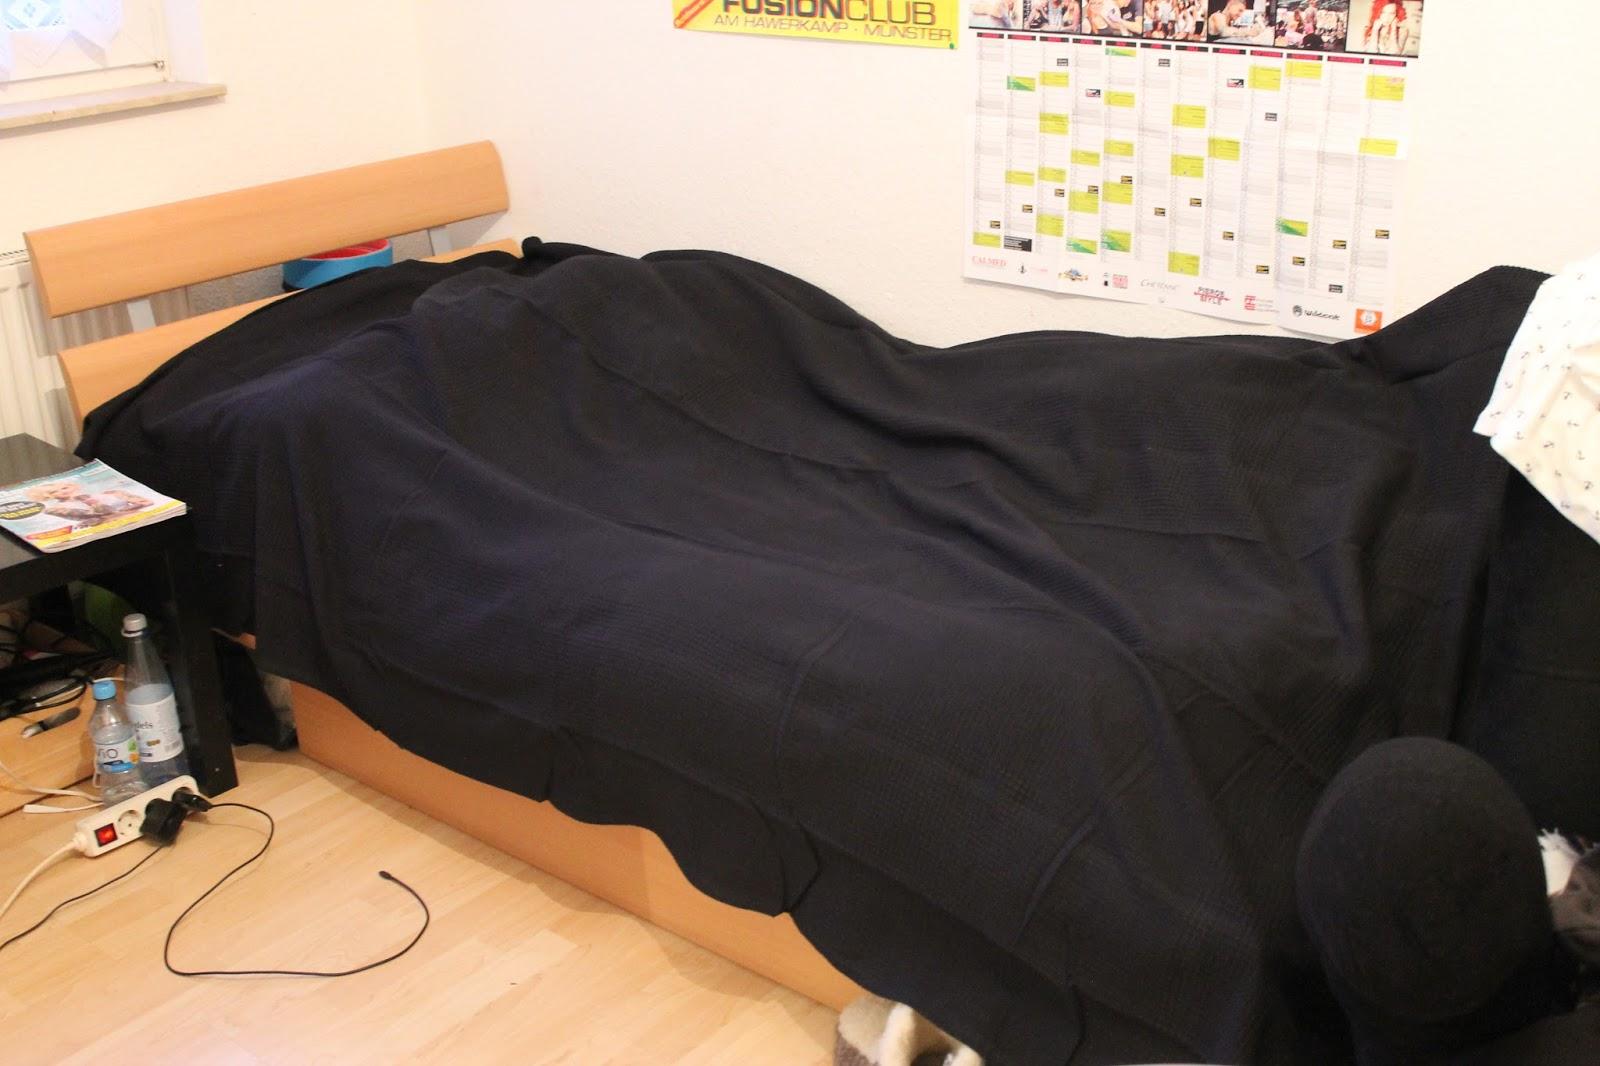 kuntergraudunkelbunt ikea haul 1. Black Bedroom Furniture Sets. Home Design Ideas